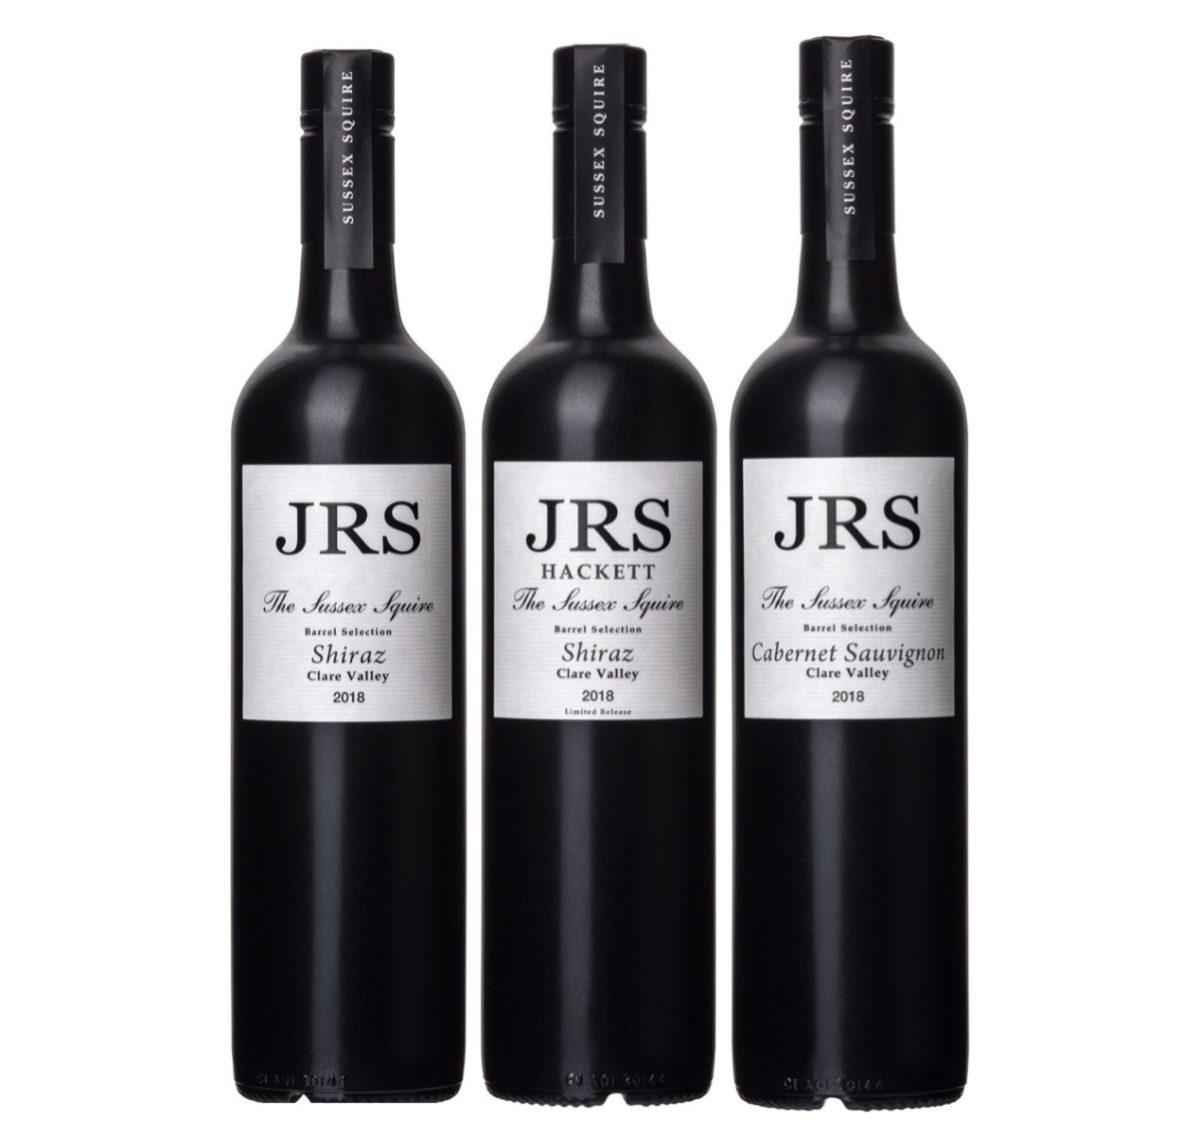 JRS Barrel Selection Wines